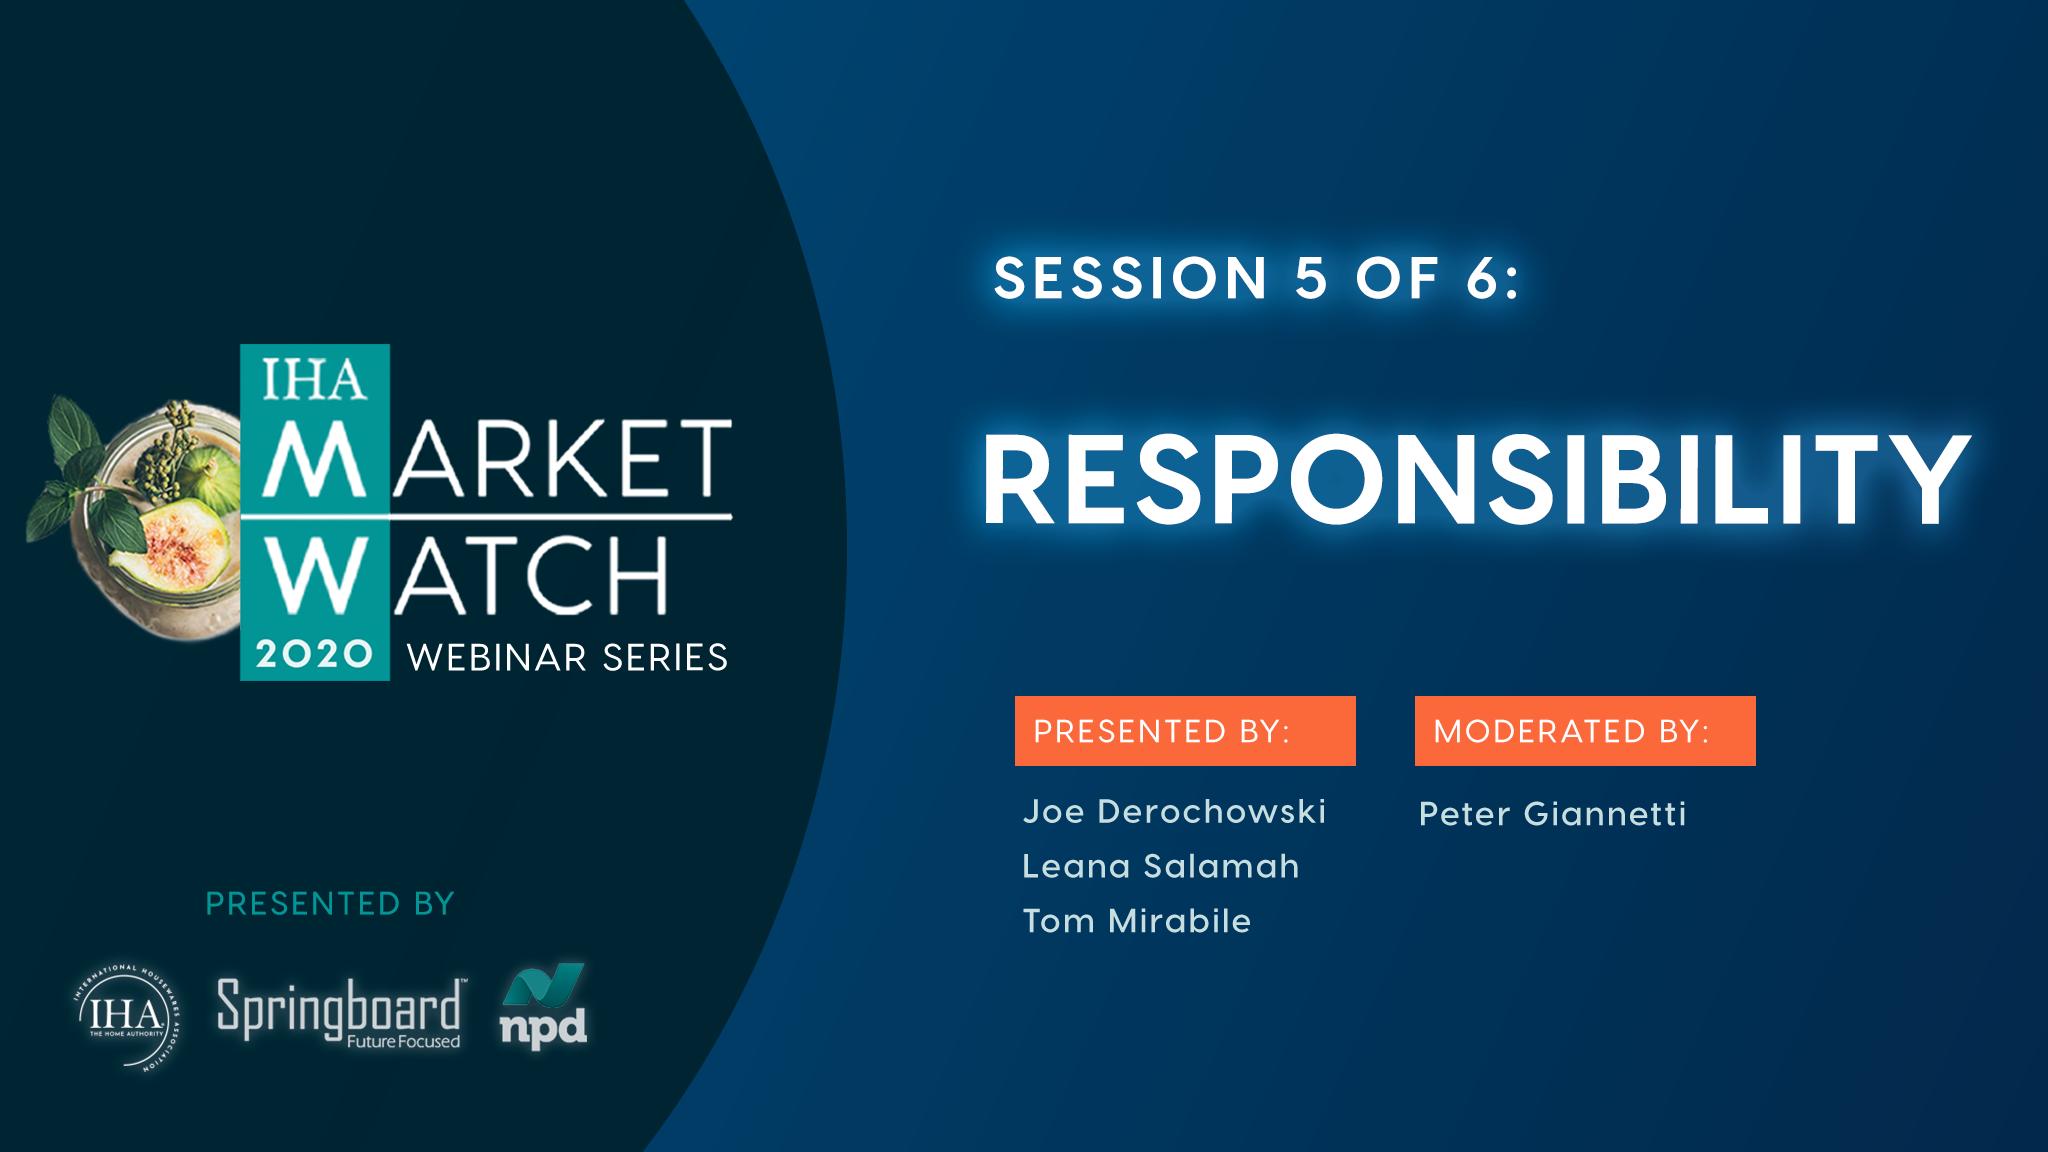 IHA Market Watch - Session 5 - Responsibility